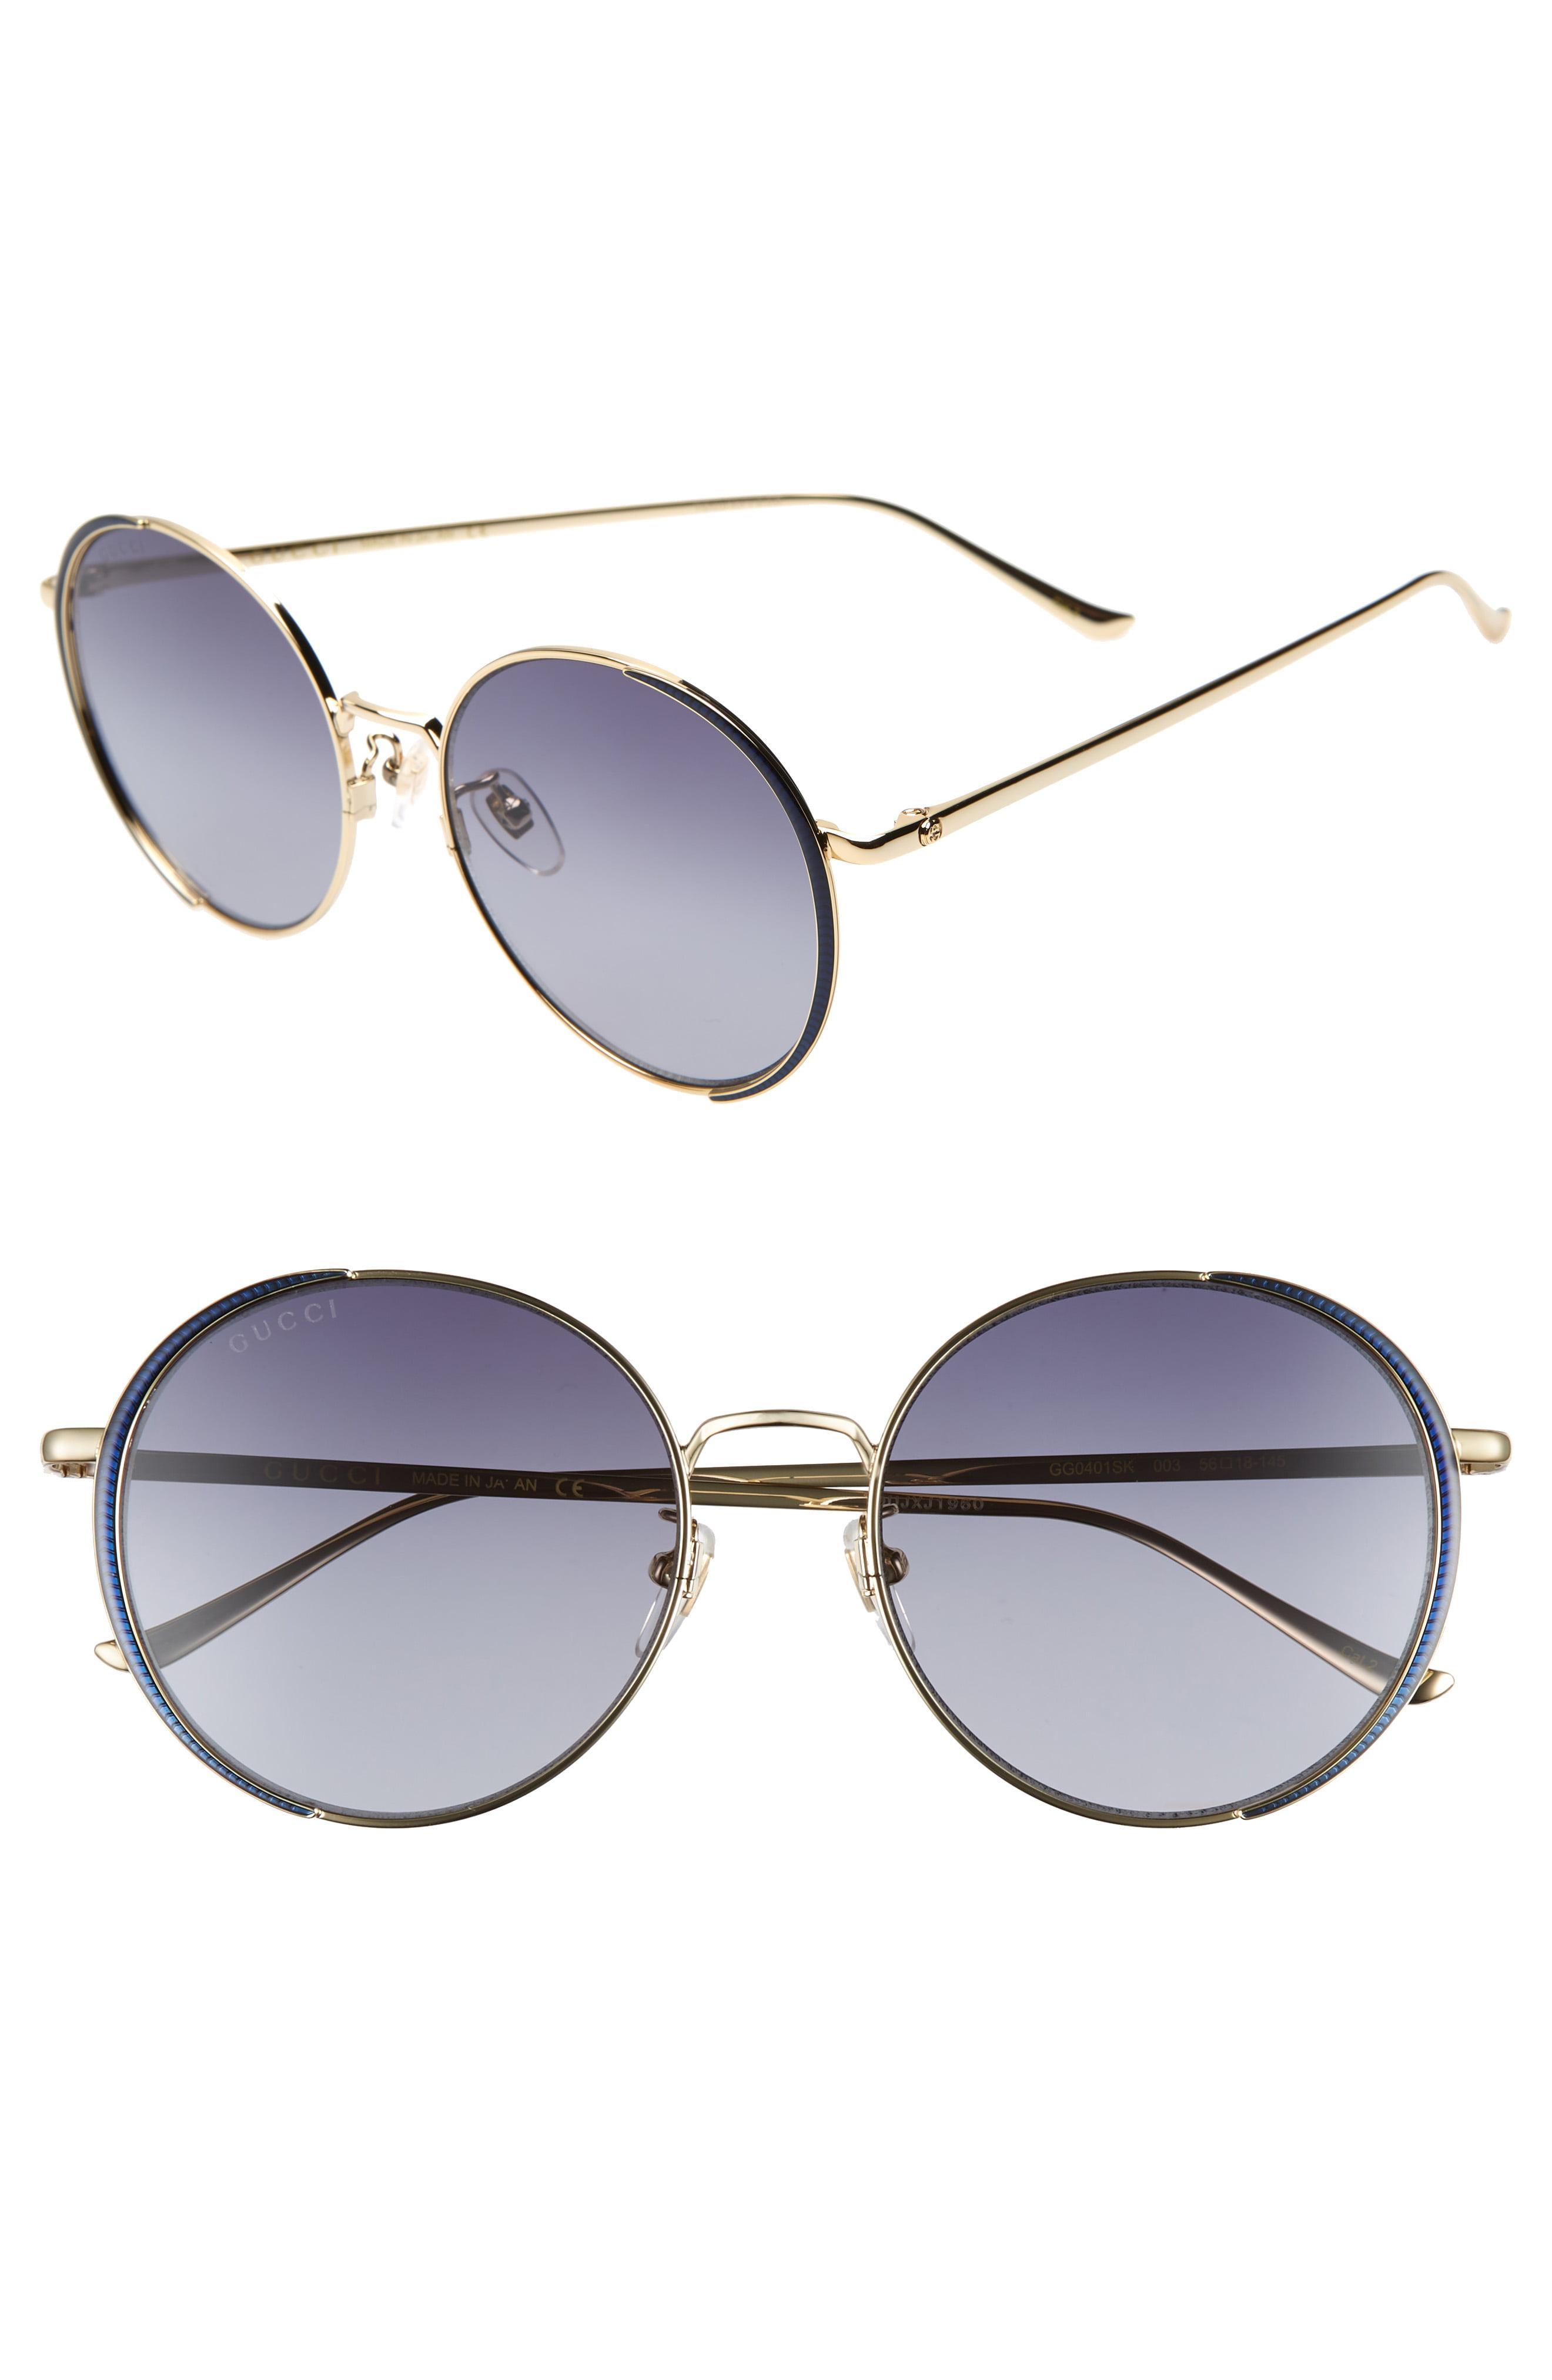 a642abc5d0f92 Gucci. Women s 56mm Gradient Round Sunglasses